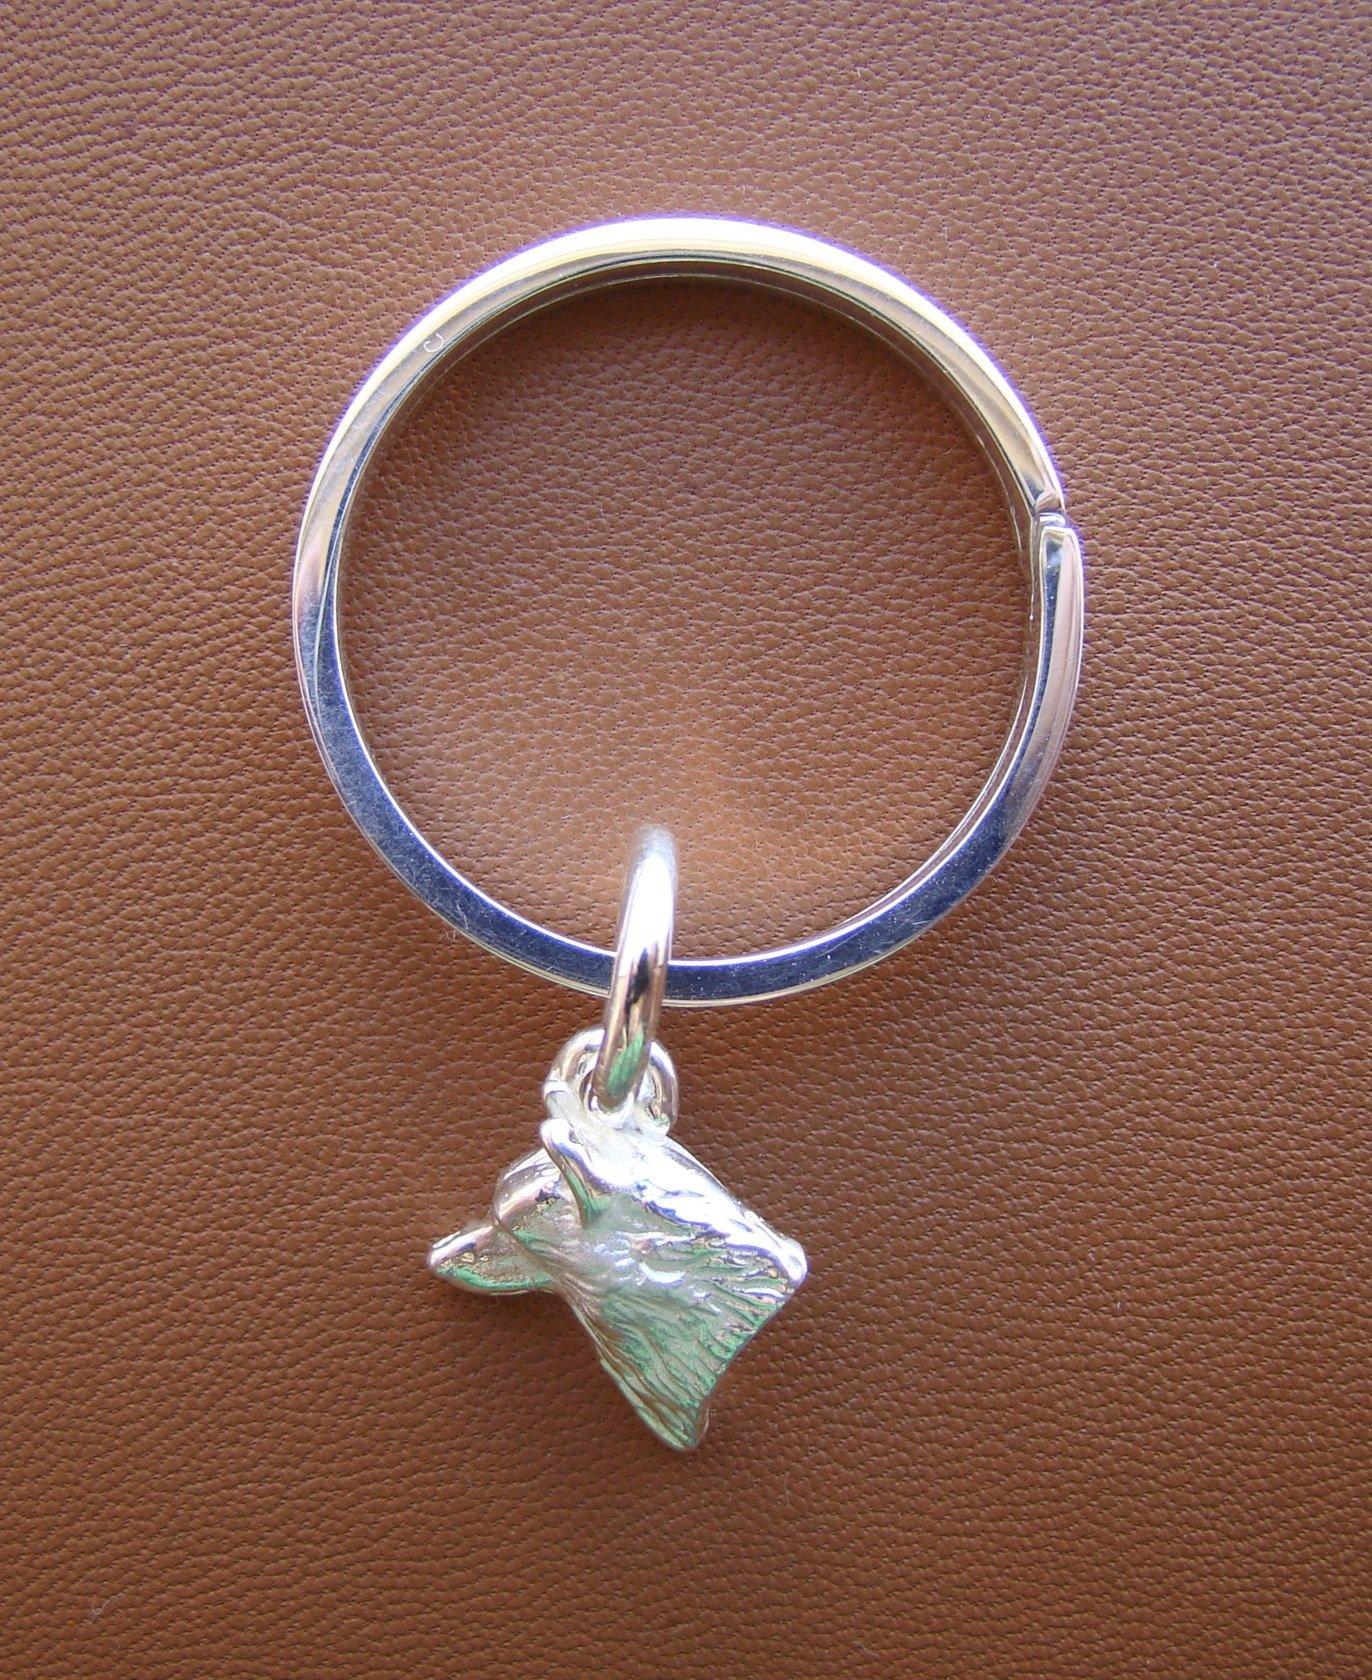 Sterling Silver Siberian Husky Head Study Key Ring by Bestk9buds